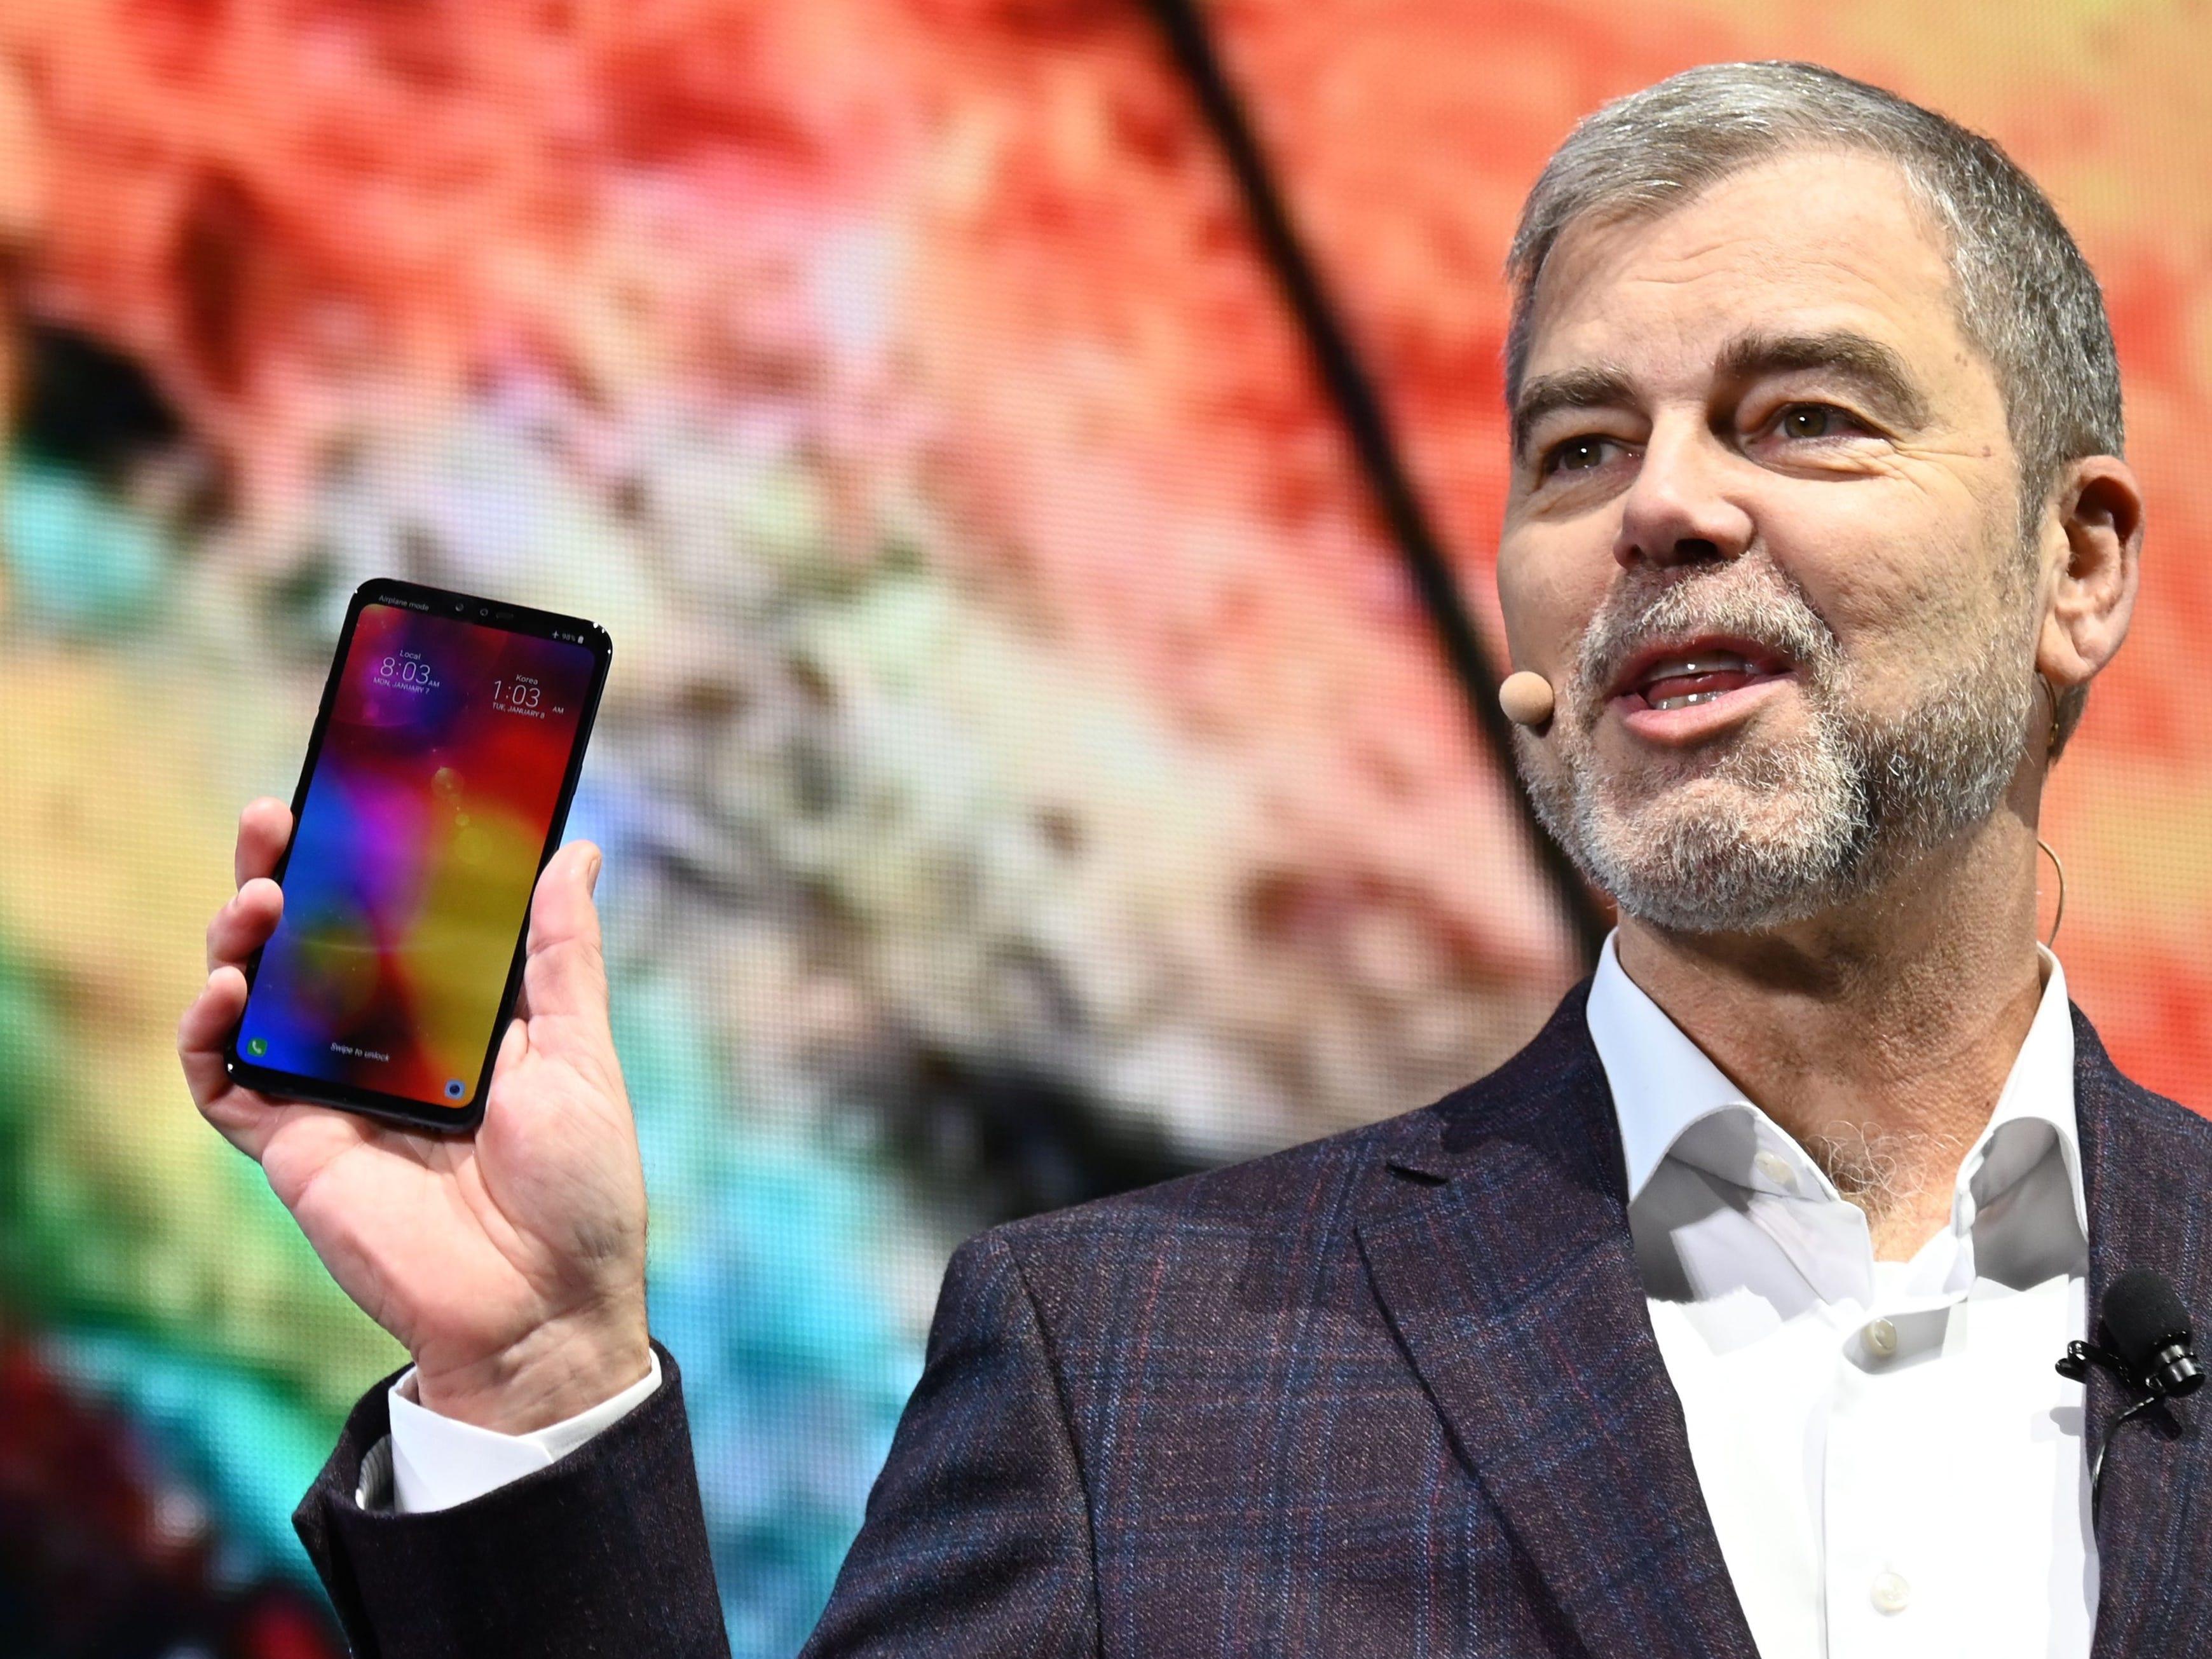 LG Senior VP David VanderWaal holds a LG V40 phone.